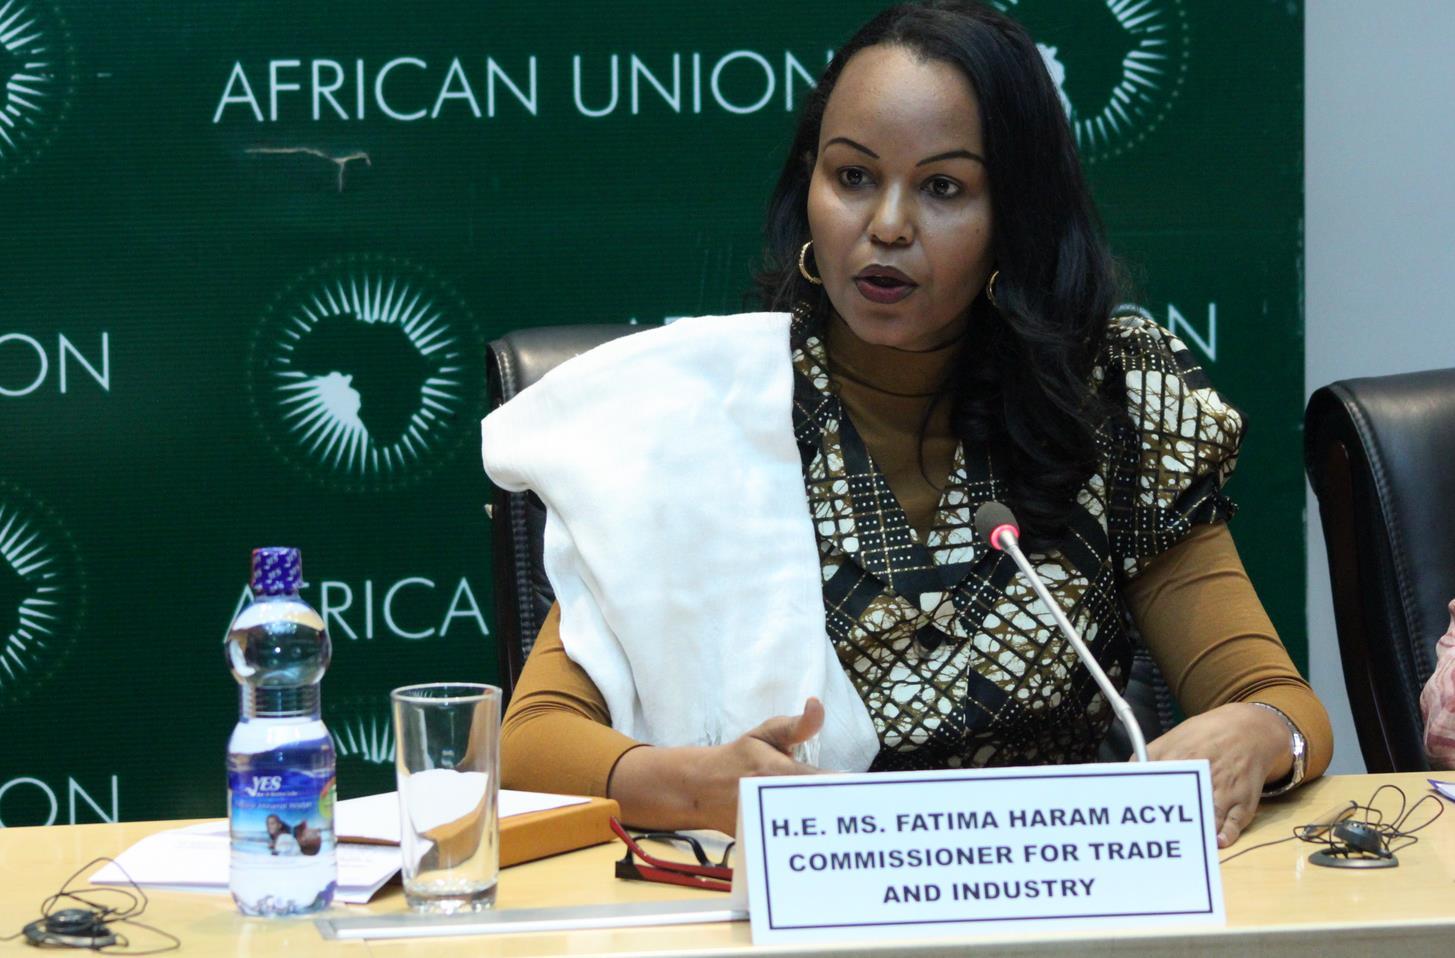 Fatima-Haram-Acyl-AU-Commissioner-for-Trade